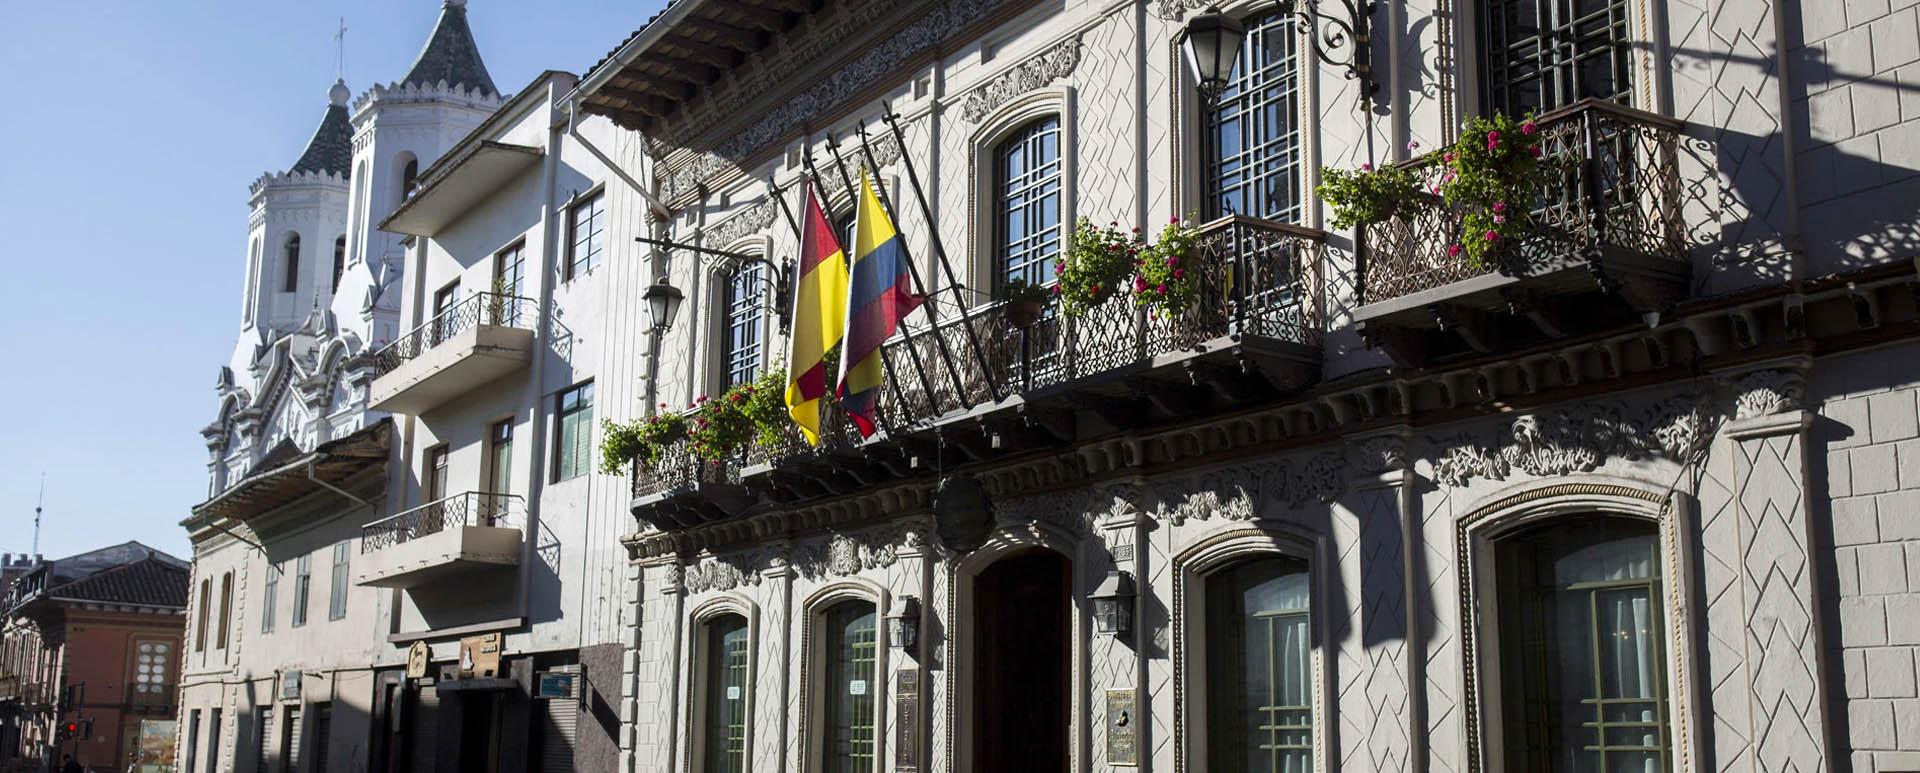 Mansion Alcazar exterior